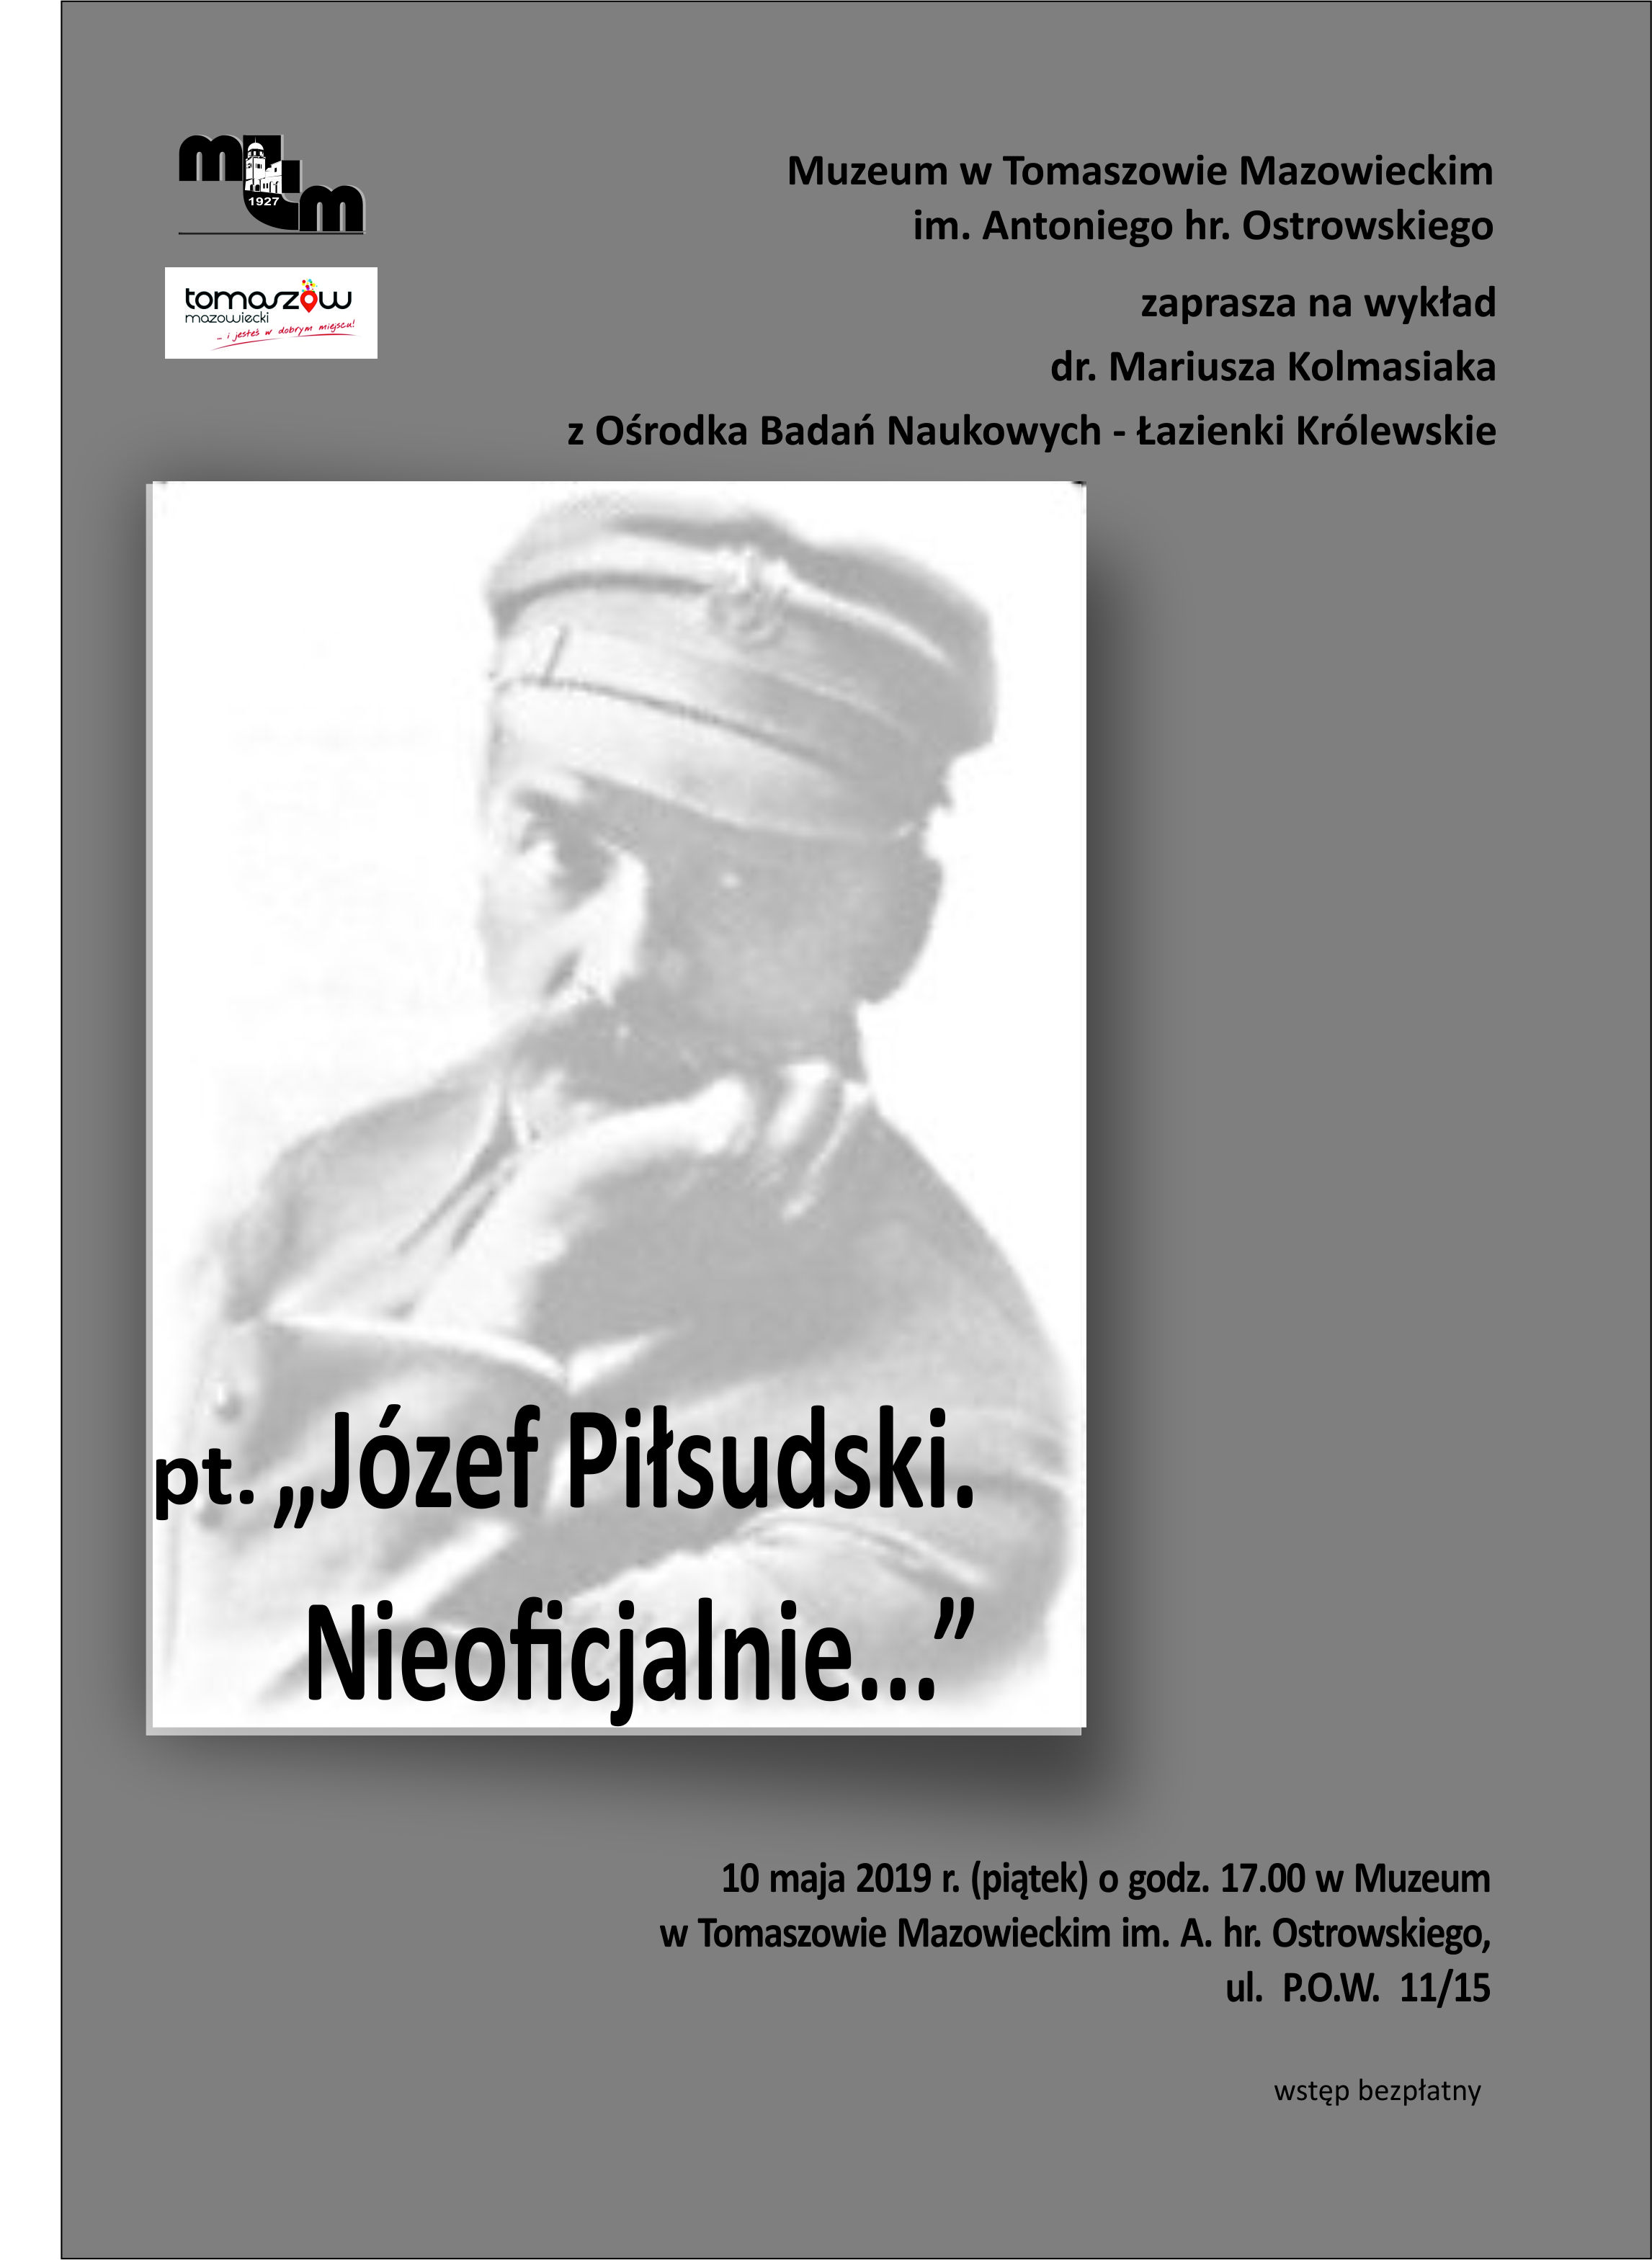 prelekcja Józef Piłsudski